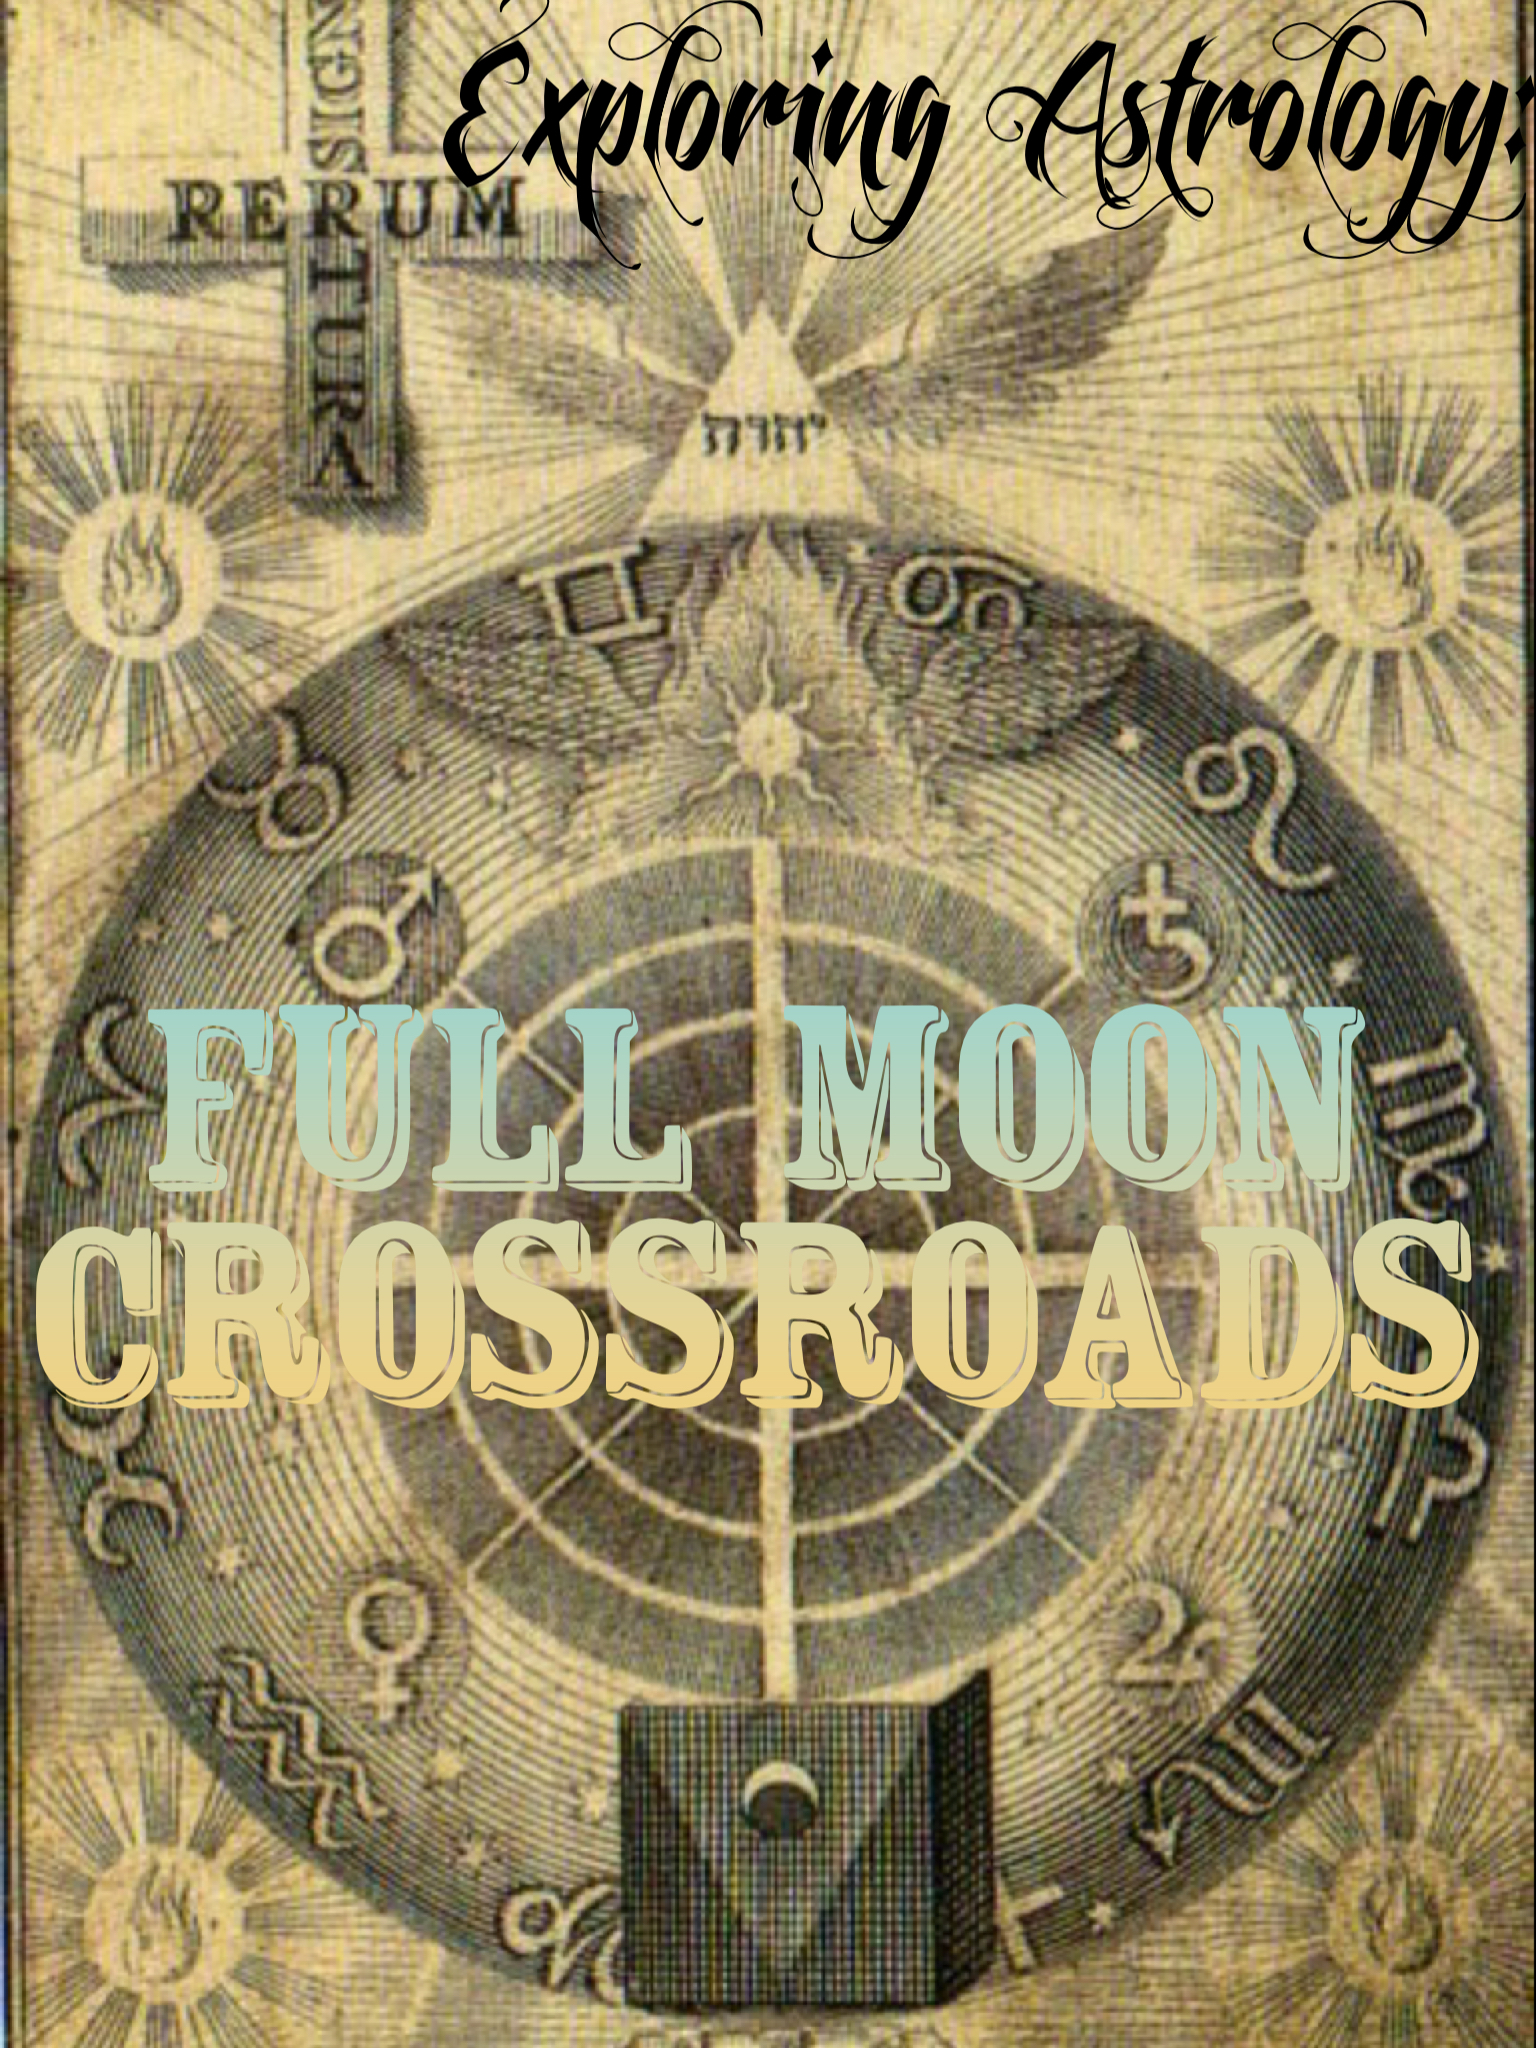 Exploring Astrology: Full Moon Crossroads